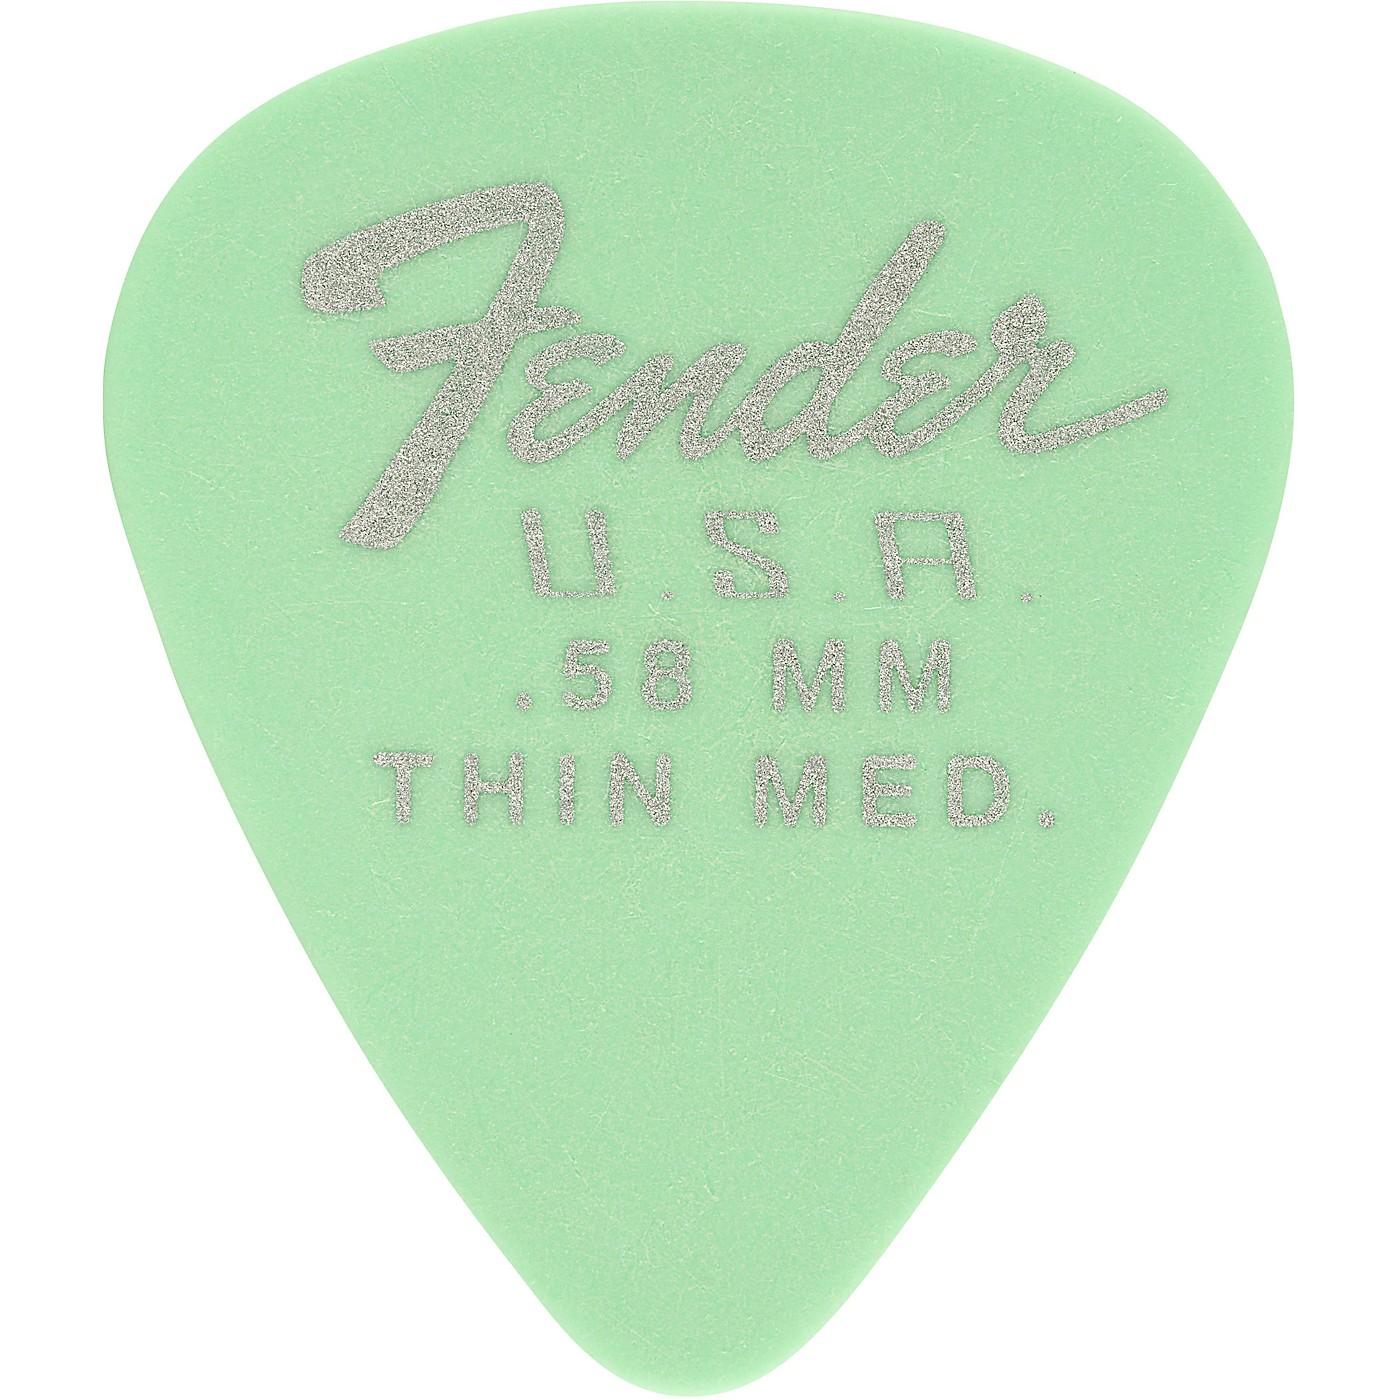 Fender 351 Dura-Tone Delrin Pick (12-Pack), Surf Green thumbnail